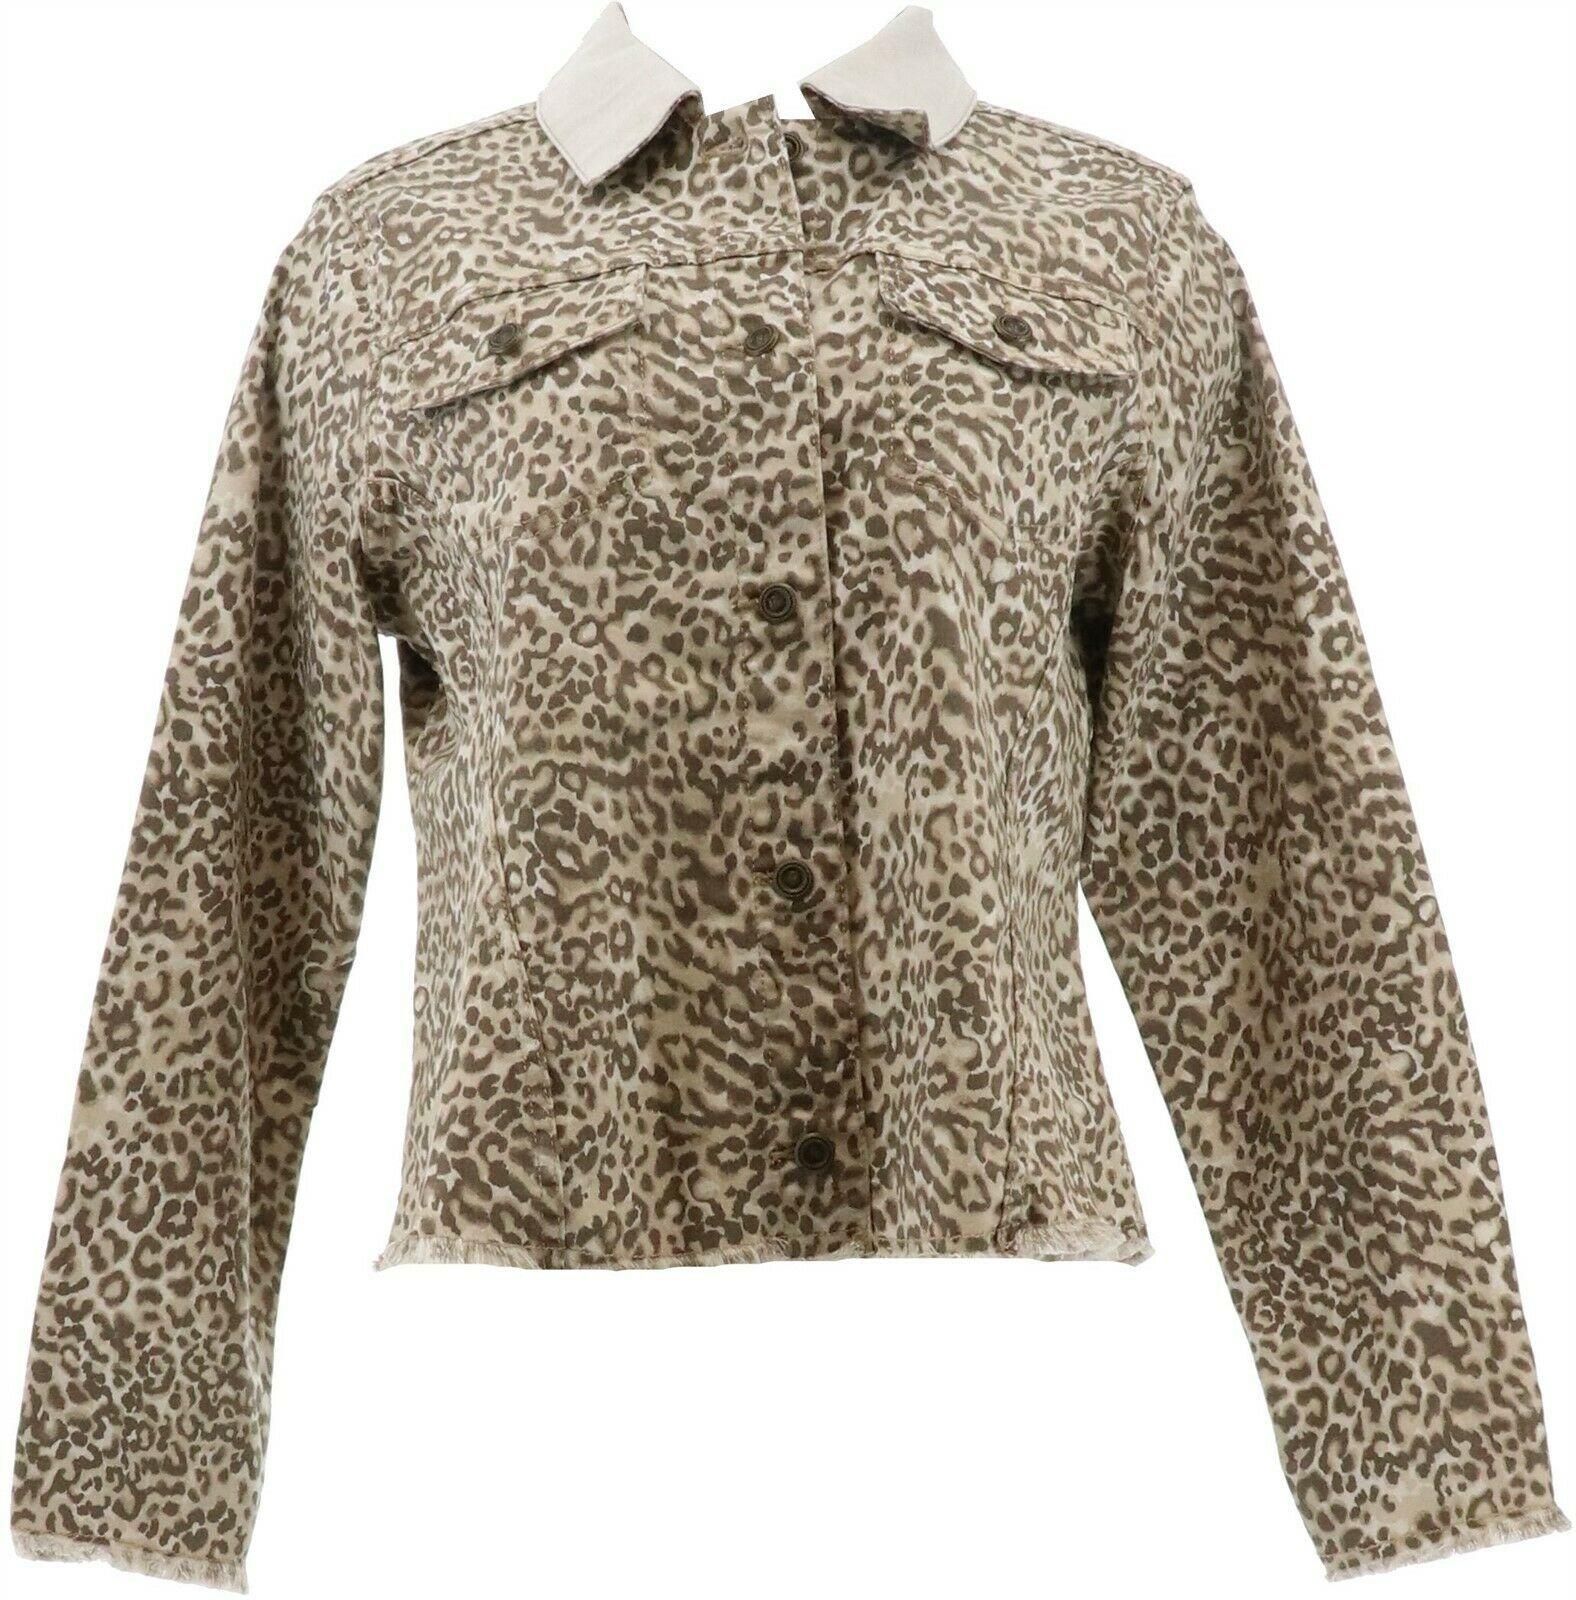 DG2 Diane Gilman Reversible Twill Denim Jacket Khaki 1X NEW 712-767